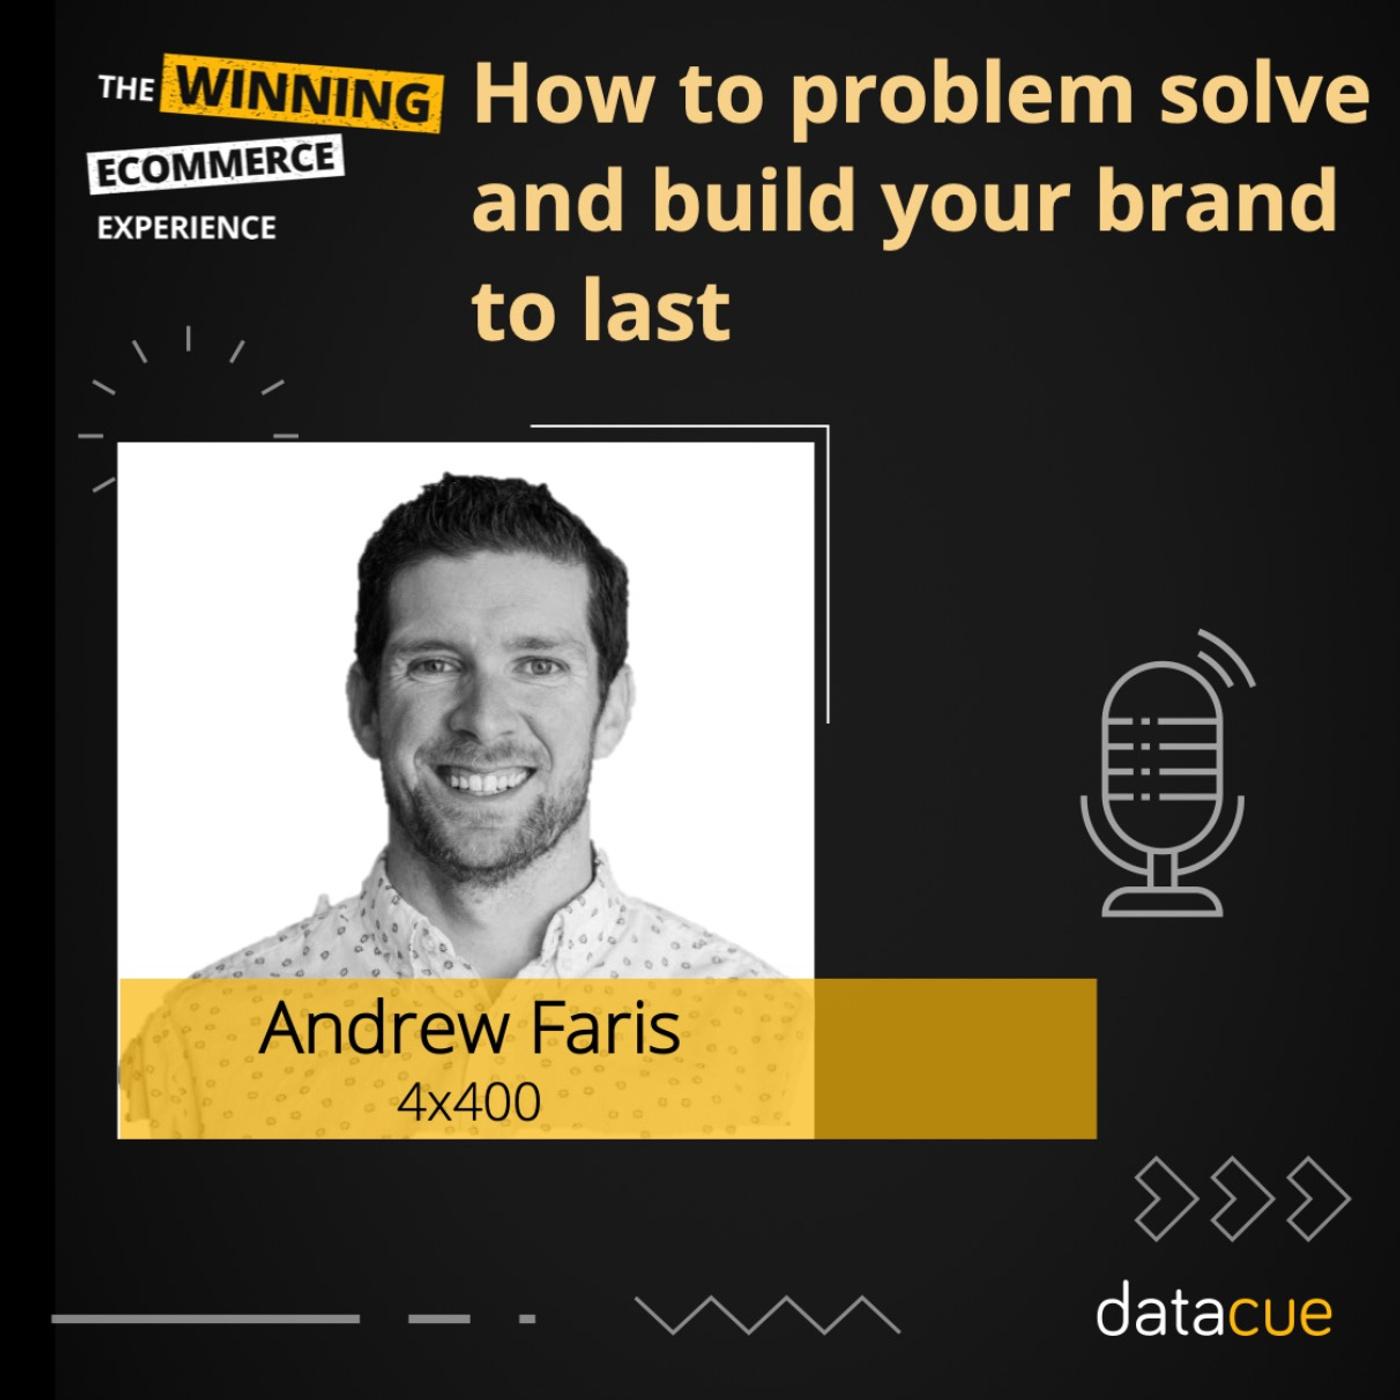 Andrew Faris